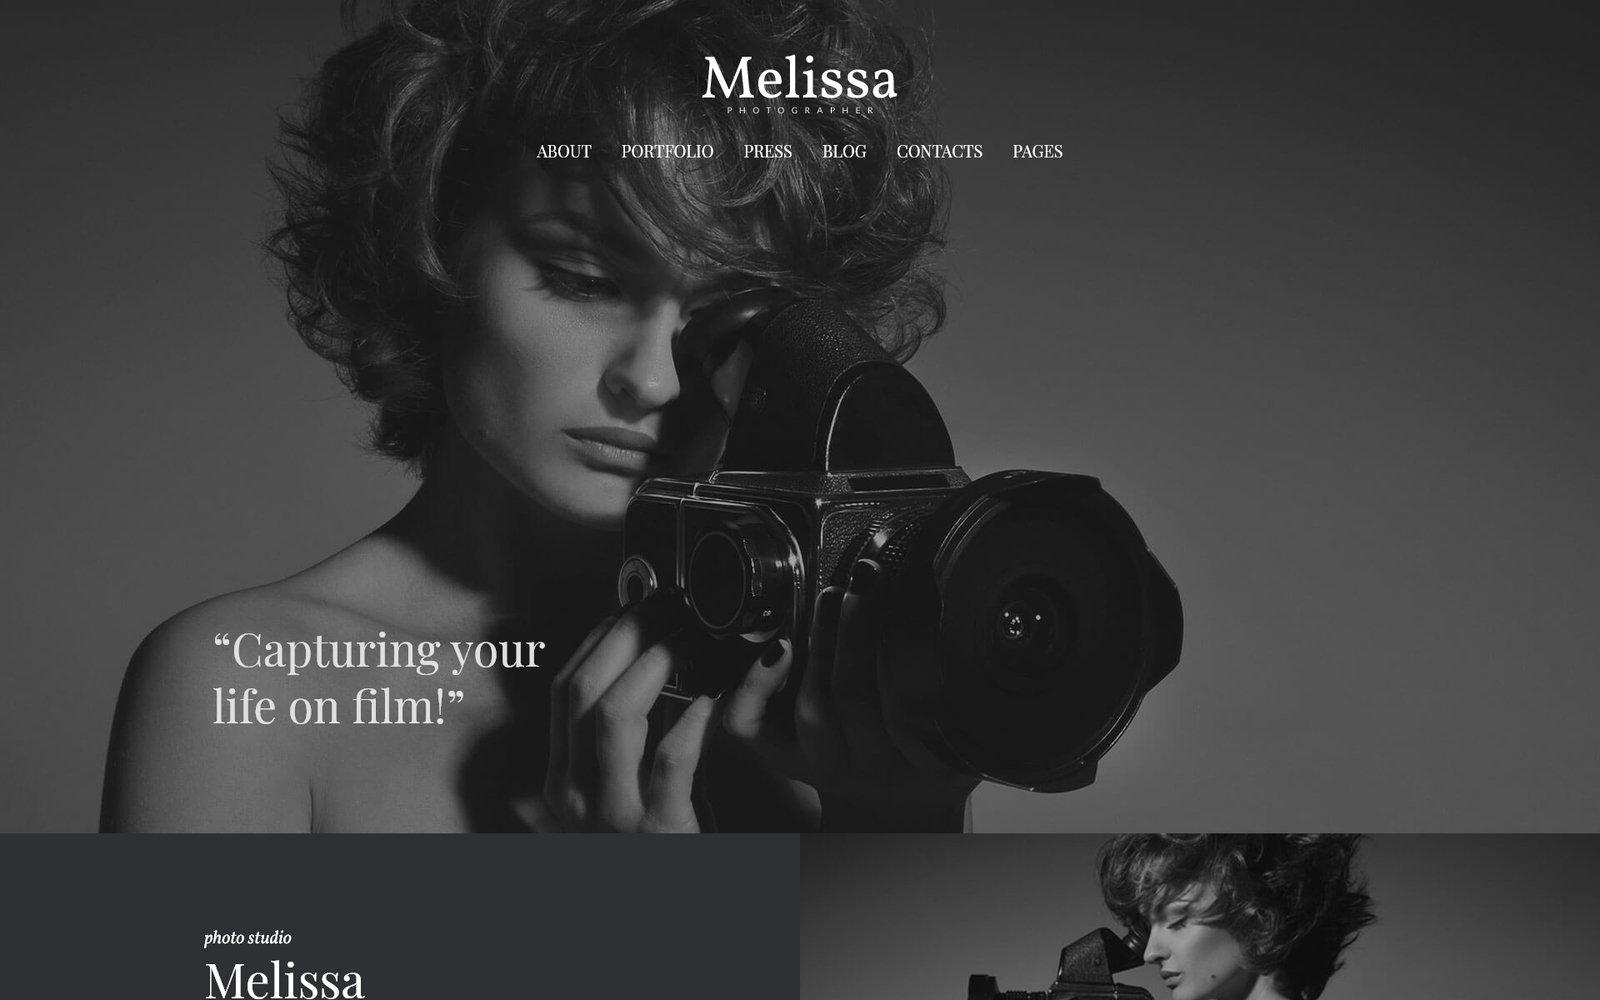 """Melissa - Art & Photography & Photographer Portfolio & Photo Studio Responsive WordPress Theme"" 响应式WordPress模板 #52153 - 截图"